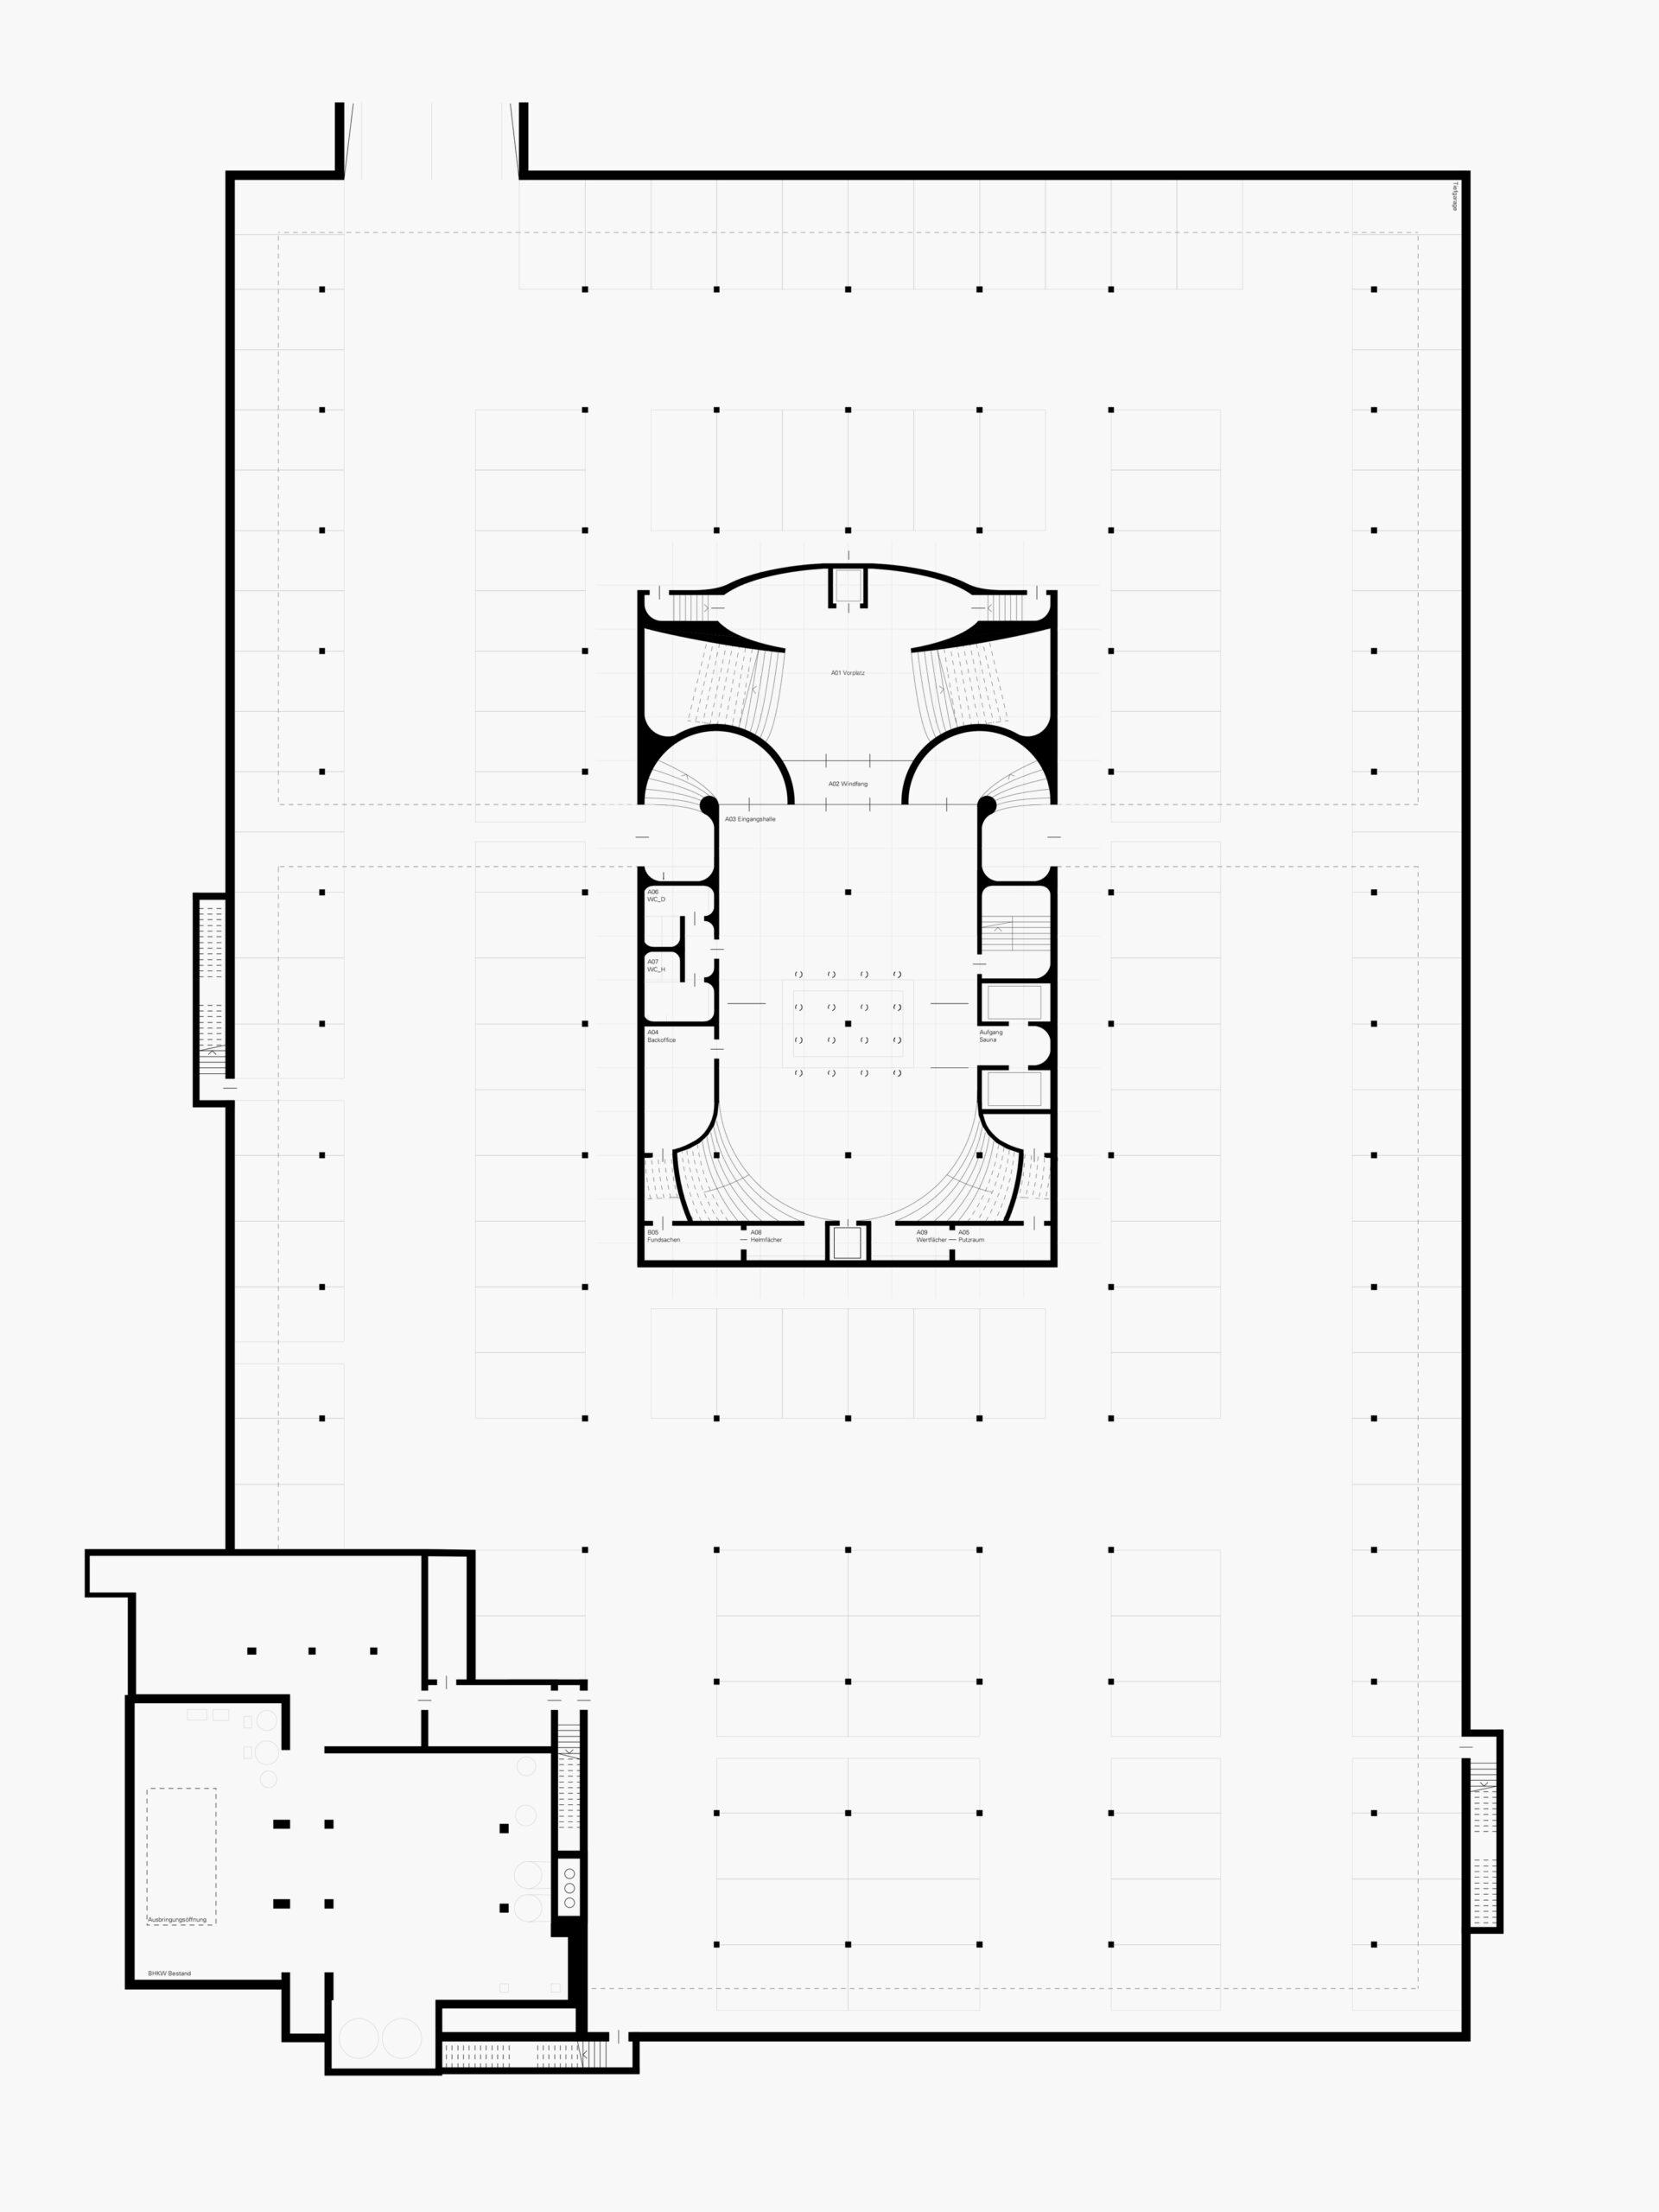 Michael-Becker-Architects-Architekten-Therme-Oberstdorf-Grundriss-TG